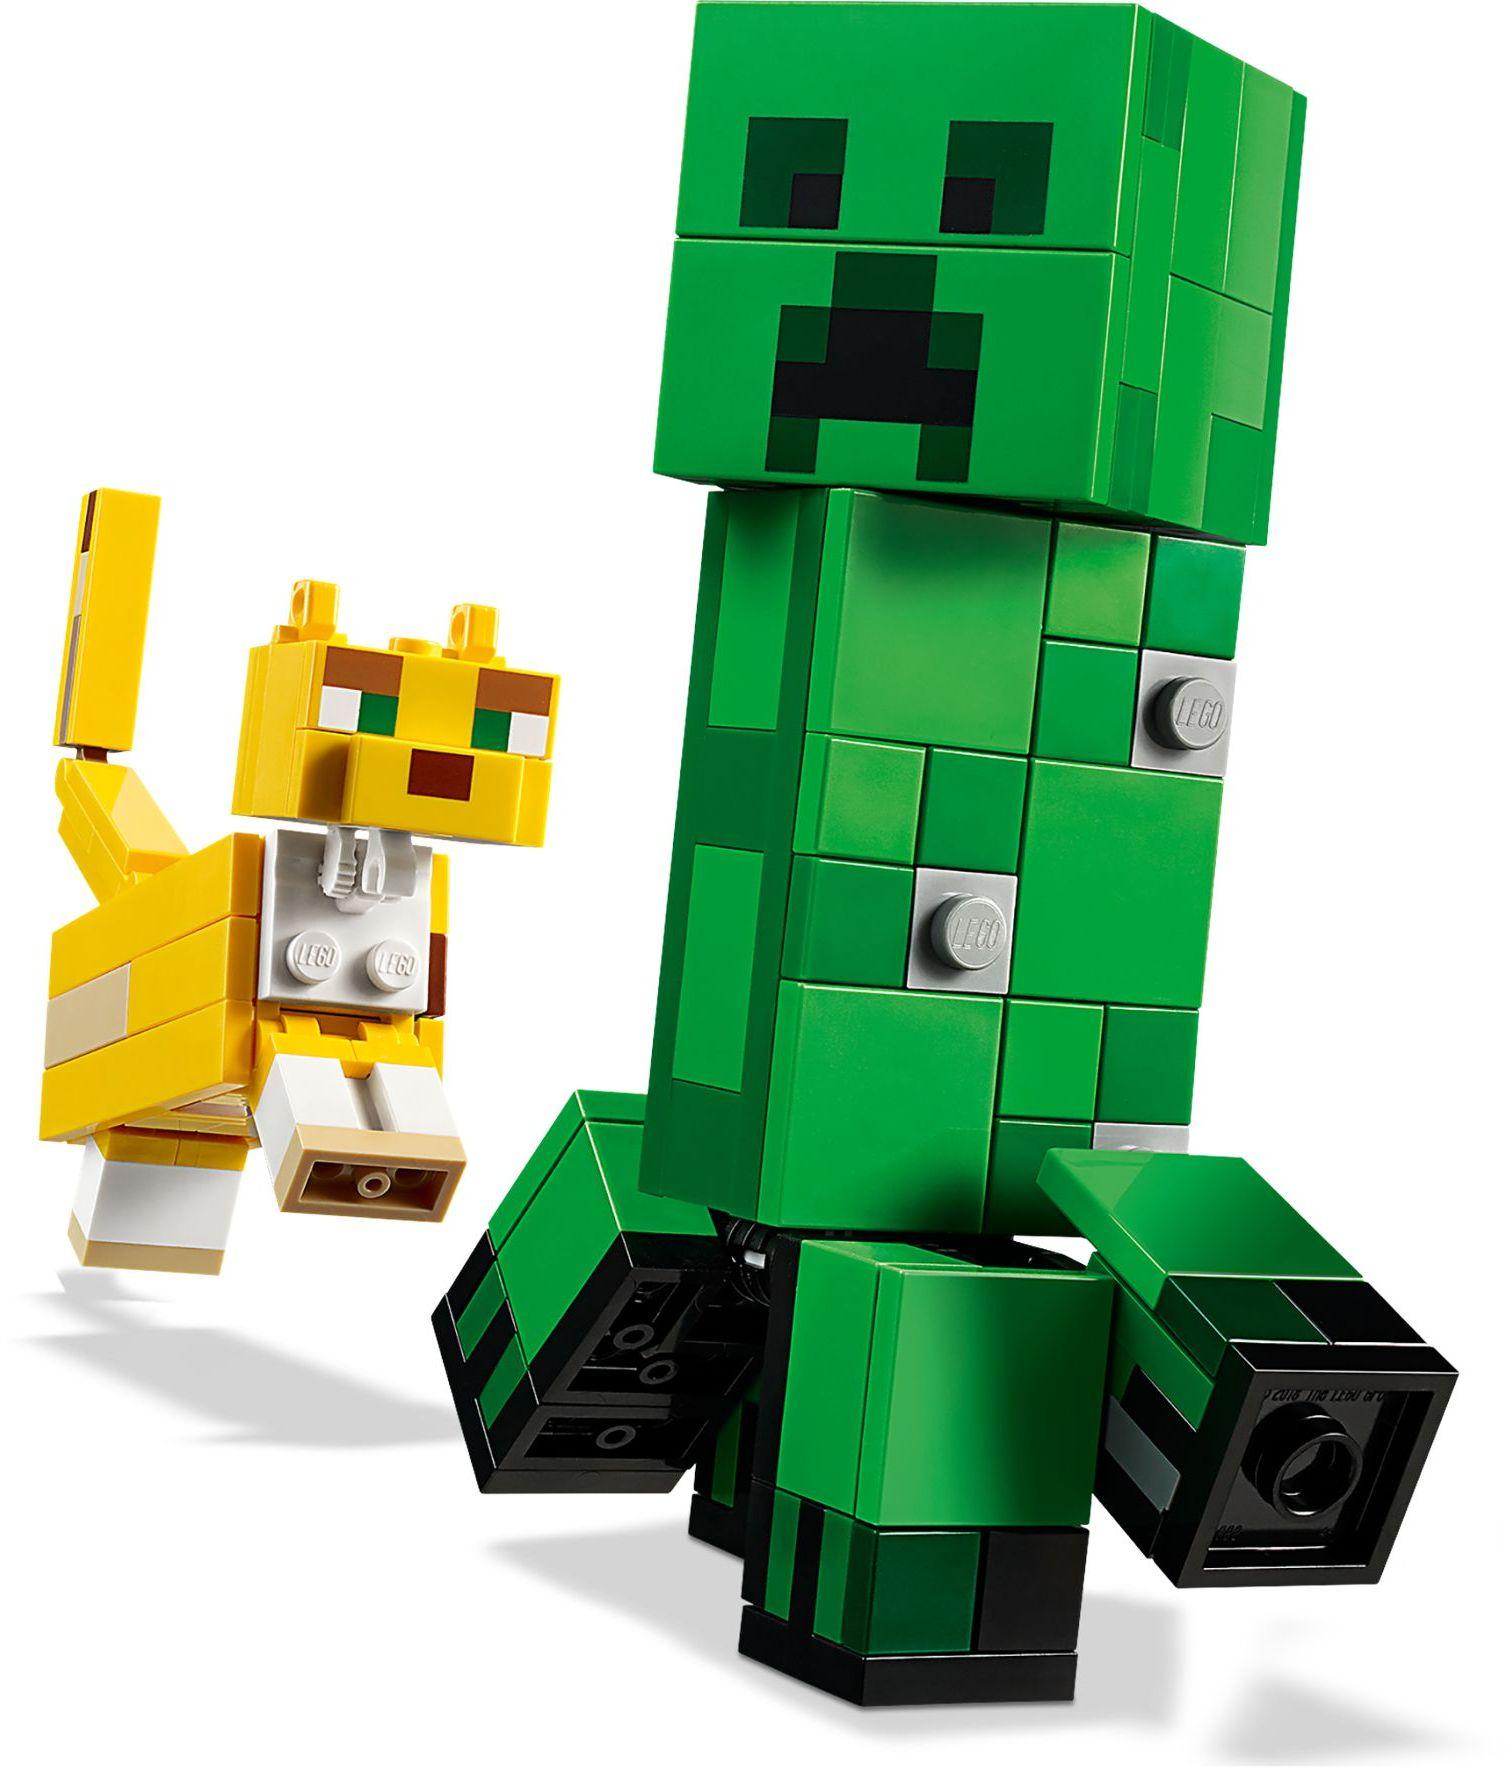 21156 LEGO Minecraft BigFig Creeper and Ocelot - Cuộc đối đầu của Creeper và mèo gấm